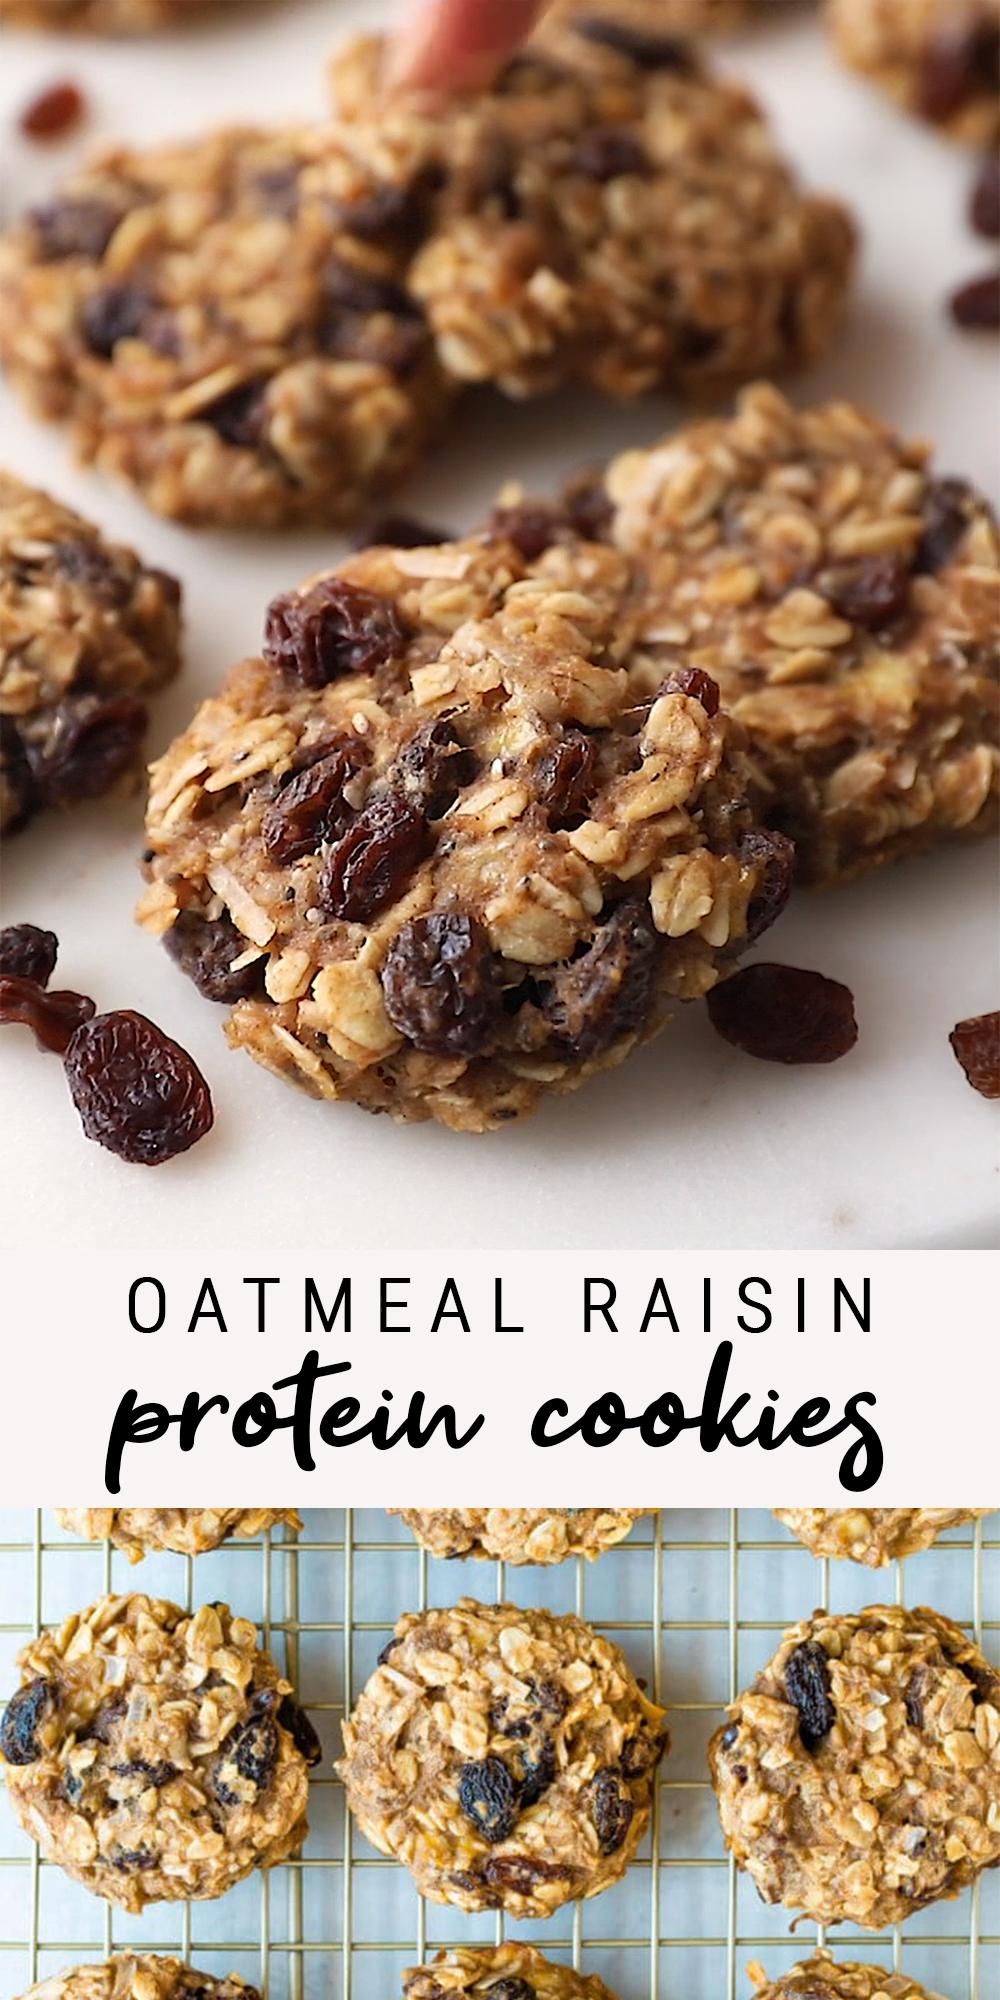 Healthy Oatmeal Raisin Protein Cookies | Easy Vegan Recipe